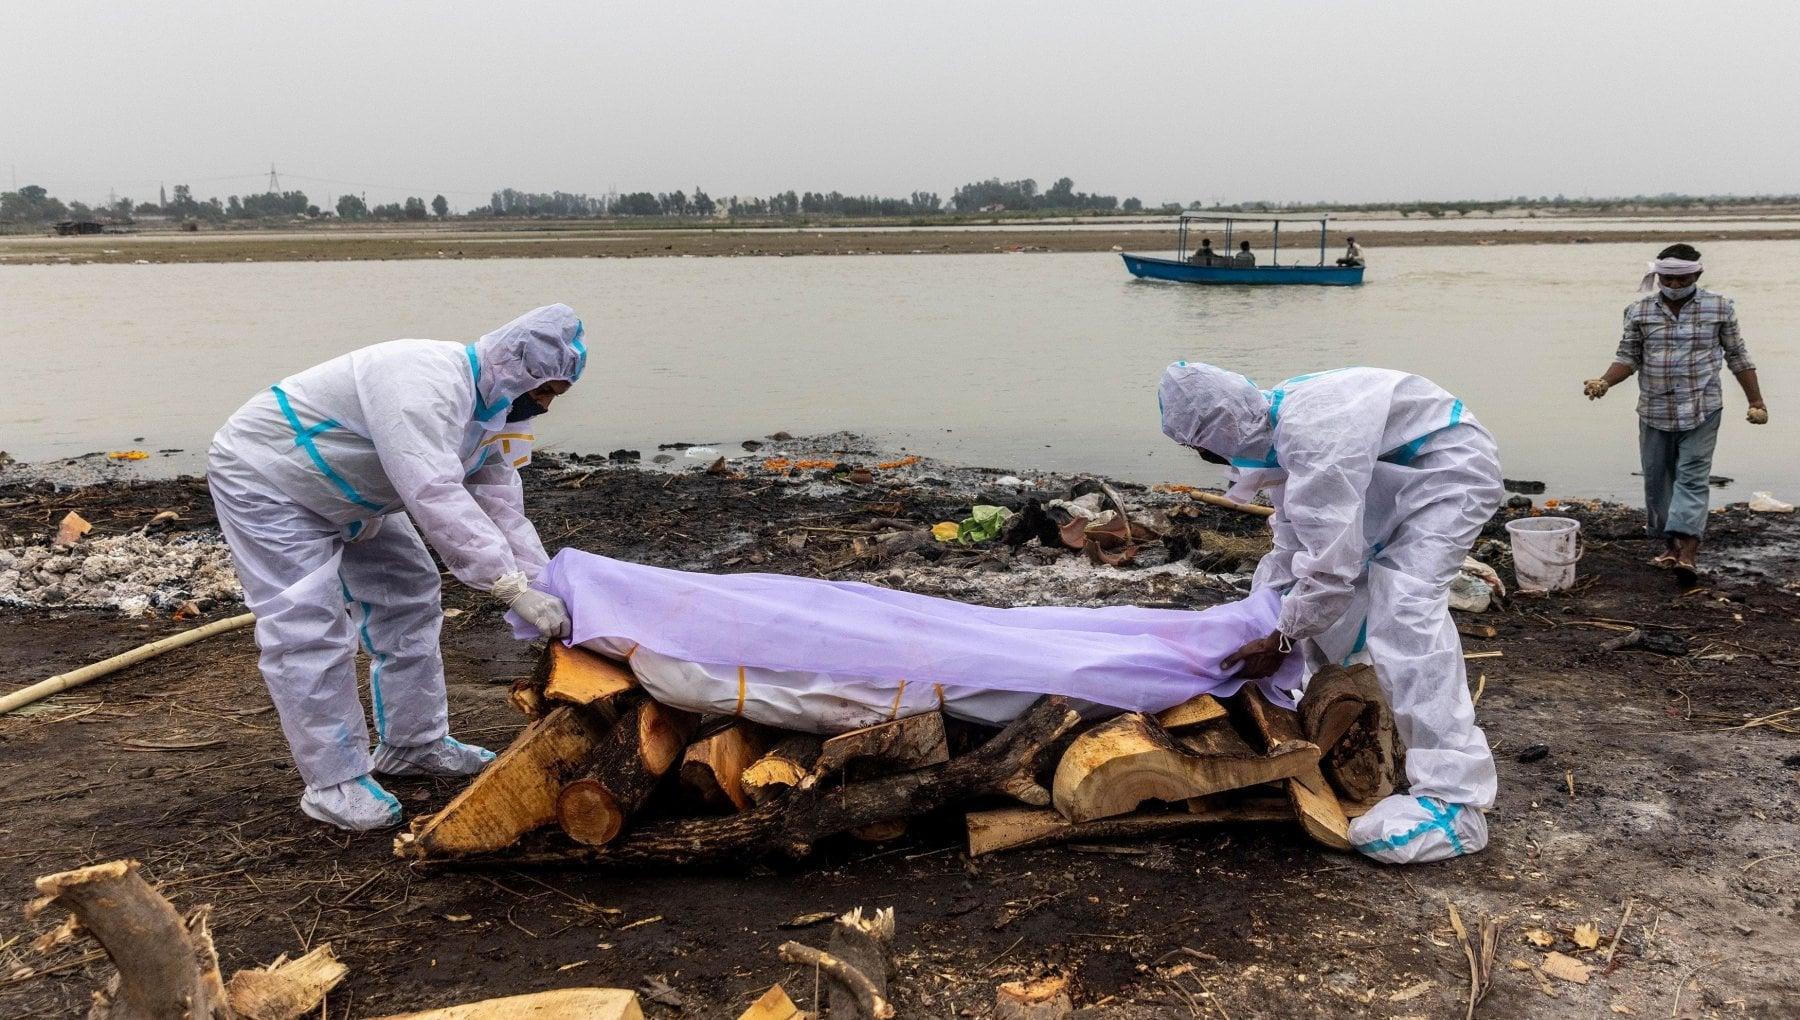 Orrore in India, il Gange restituisce decine di cadaveri.